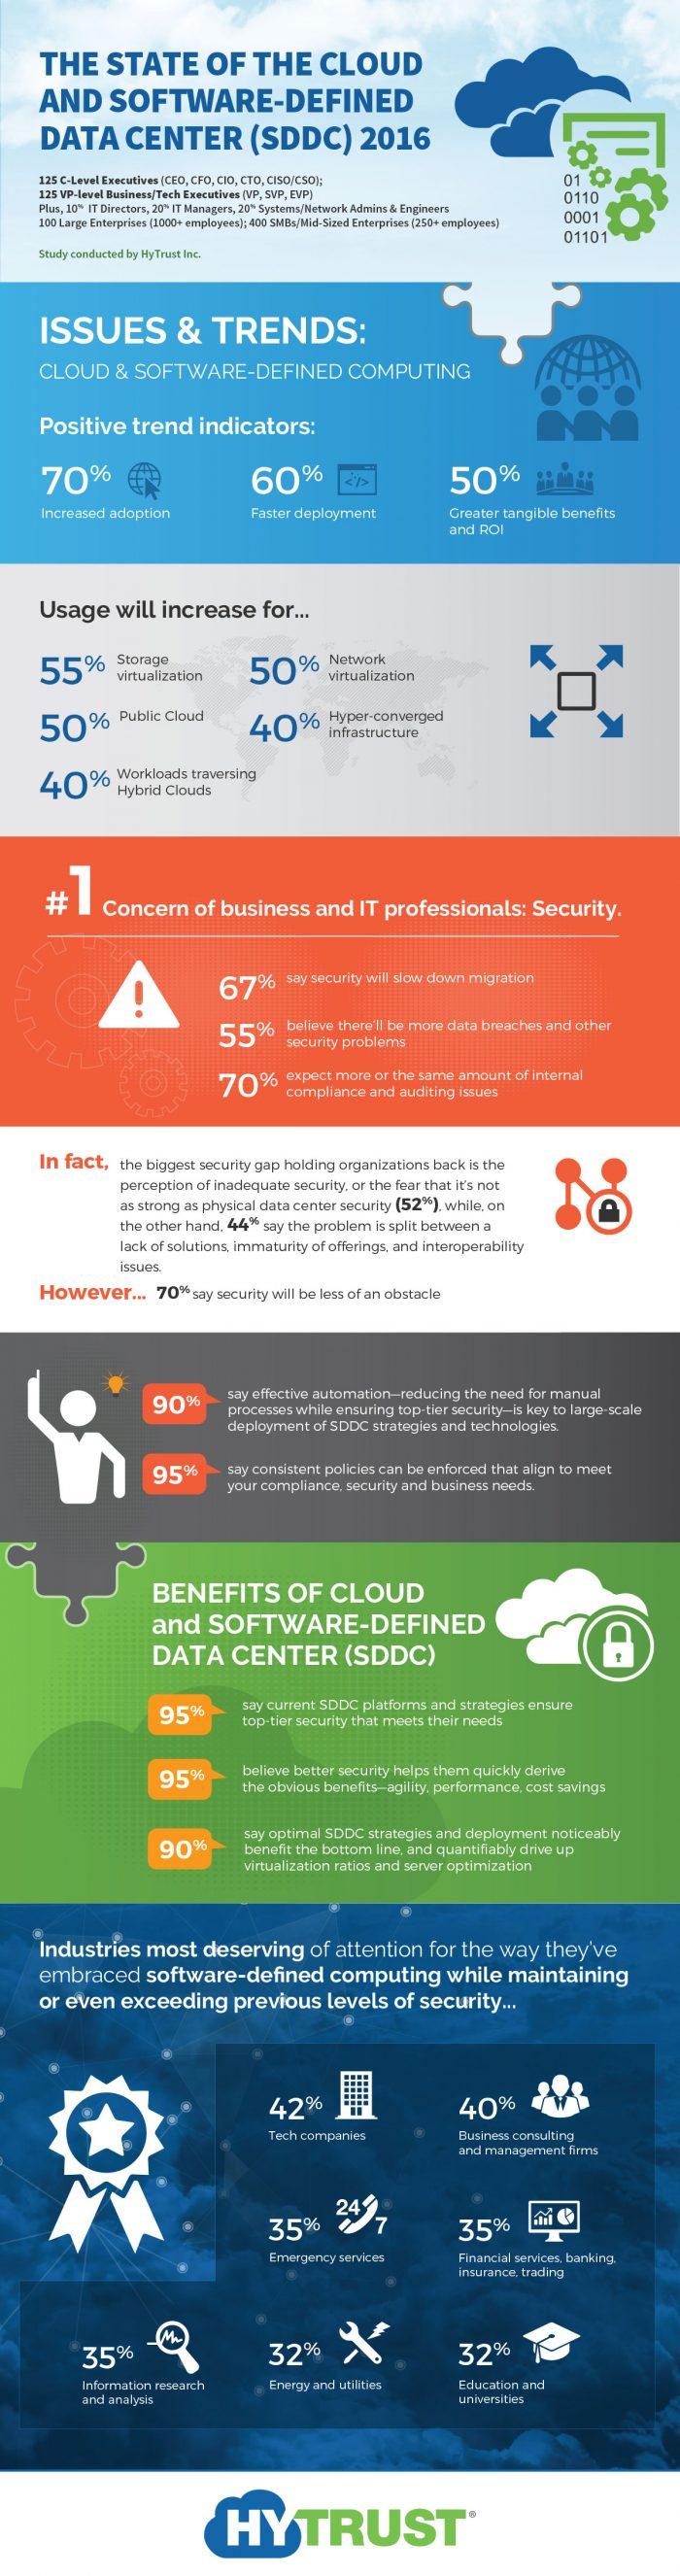 sddc-survey-infographic-2